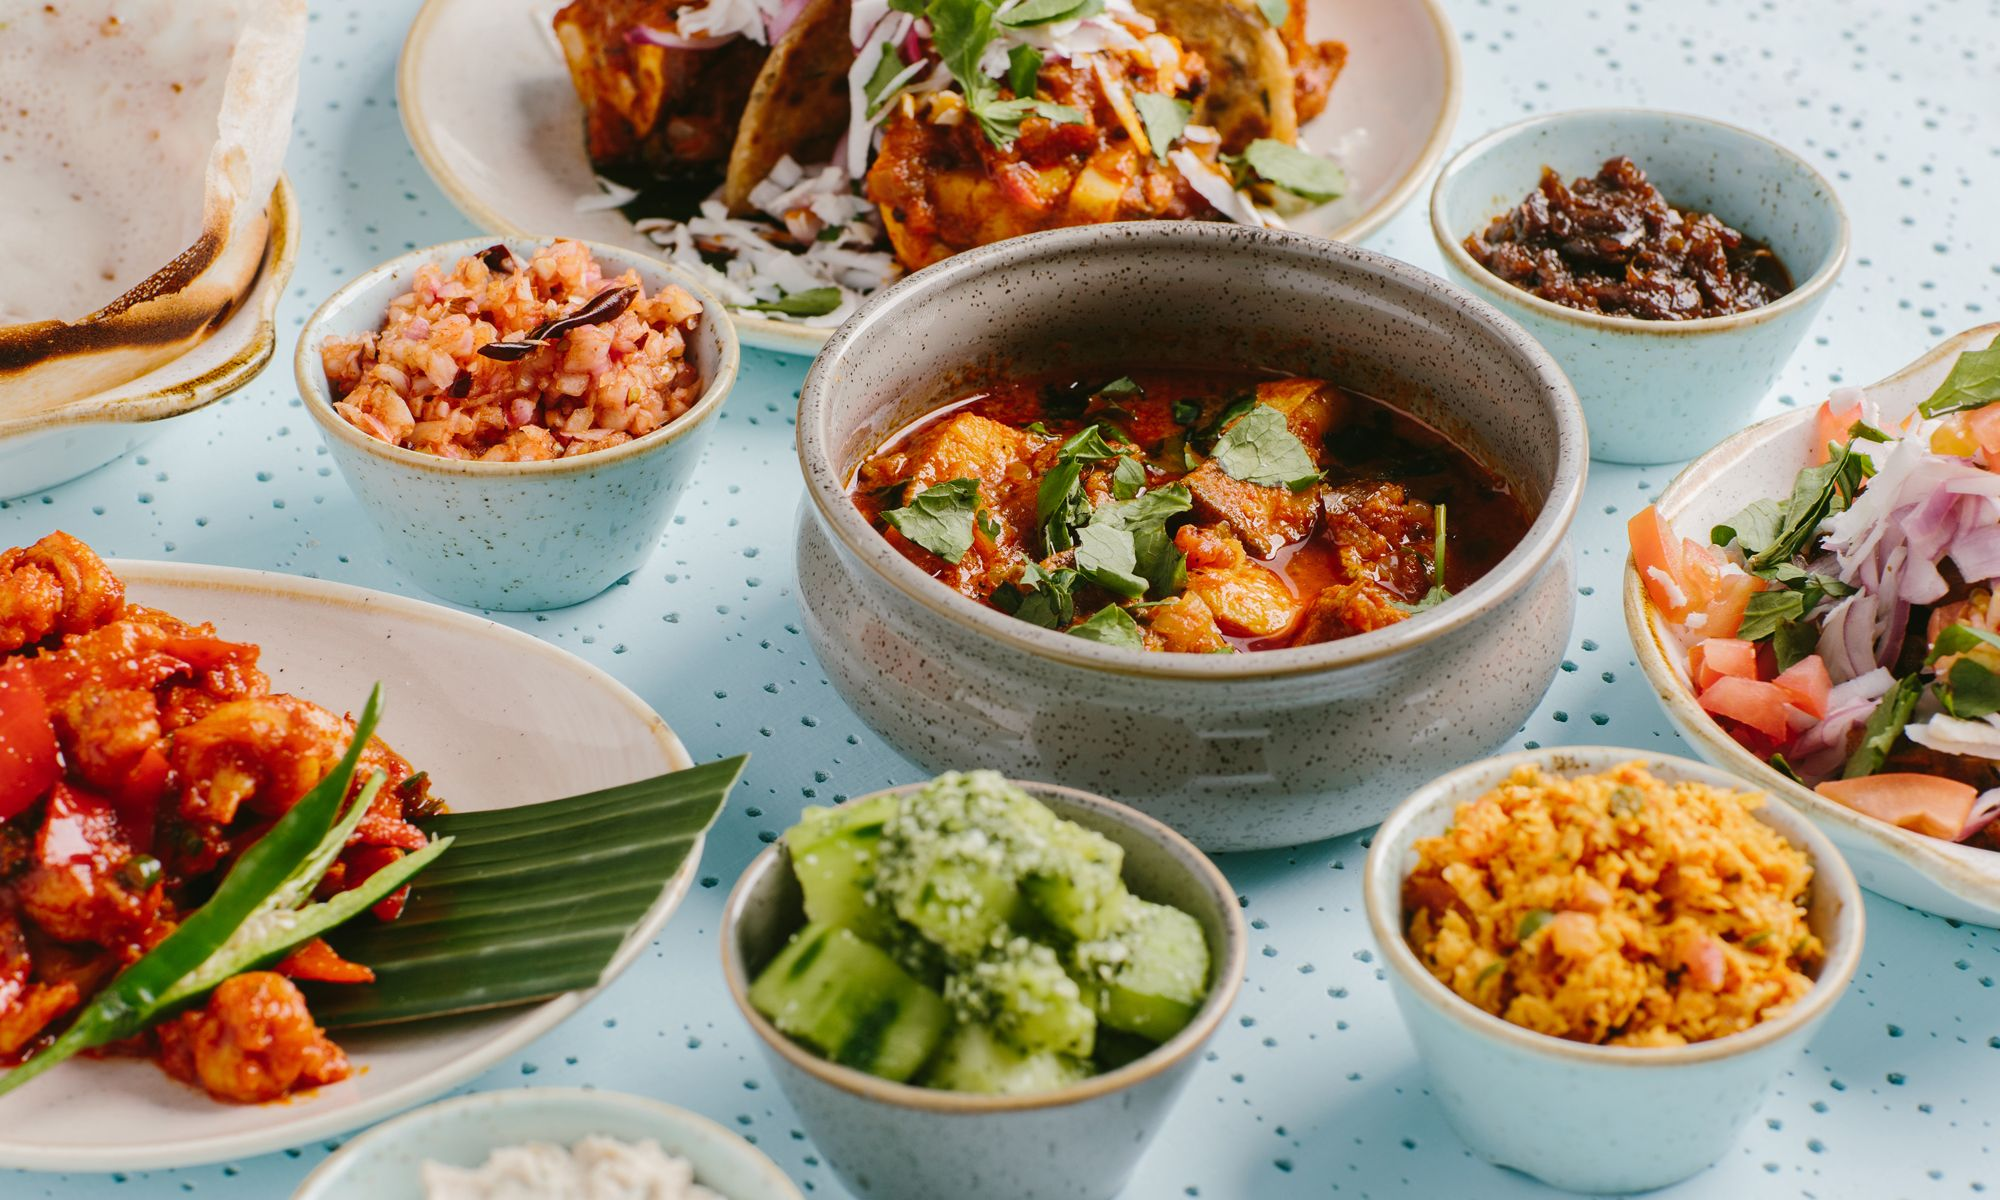 Hotal Colombo Opens, Bringing Sri Lankan Cuisine To Soho